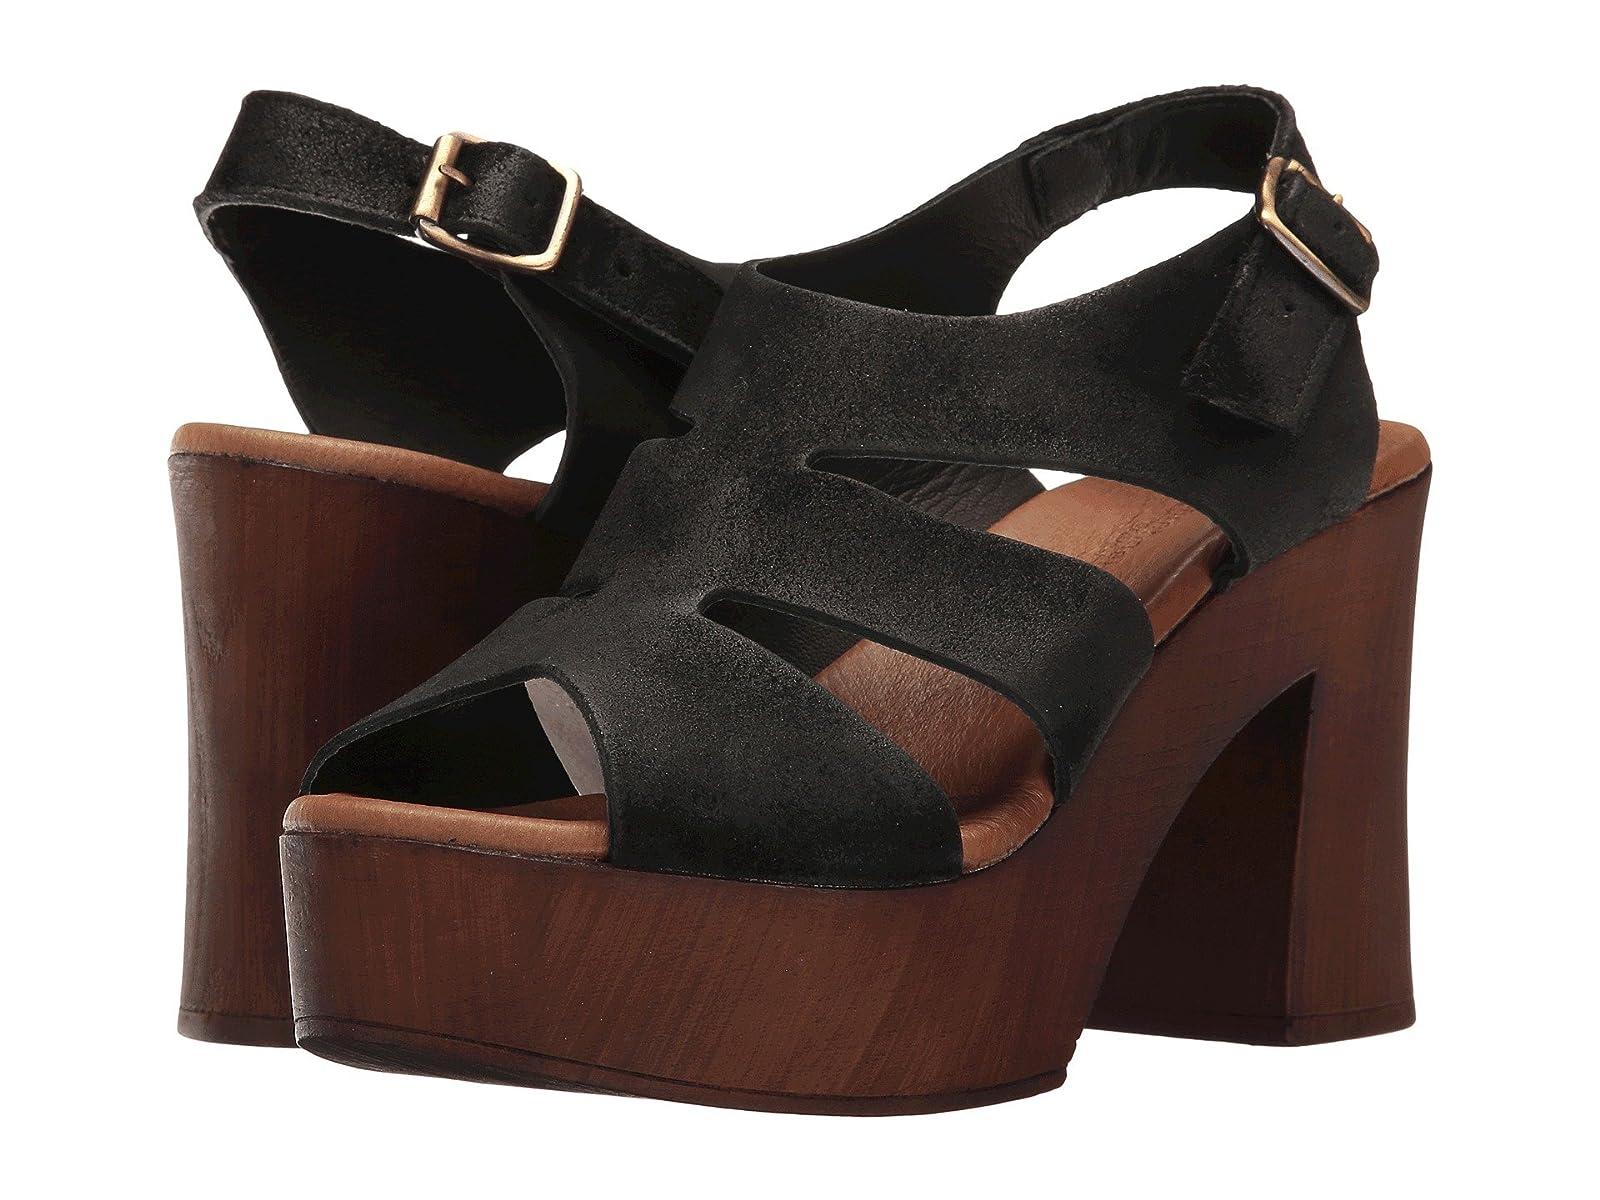 Eric Michael SiennaCheap and distinctive eye-catching shoes